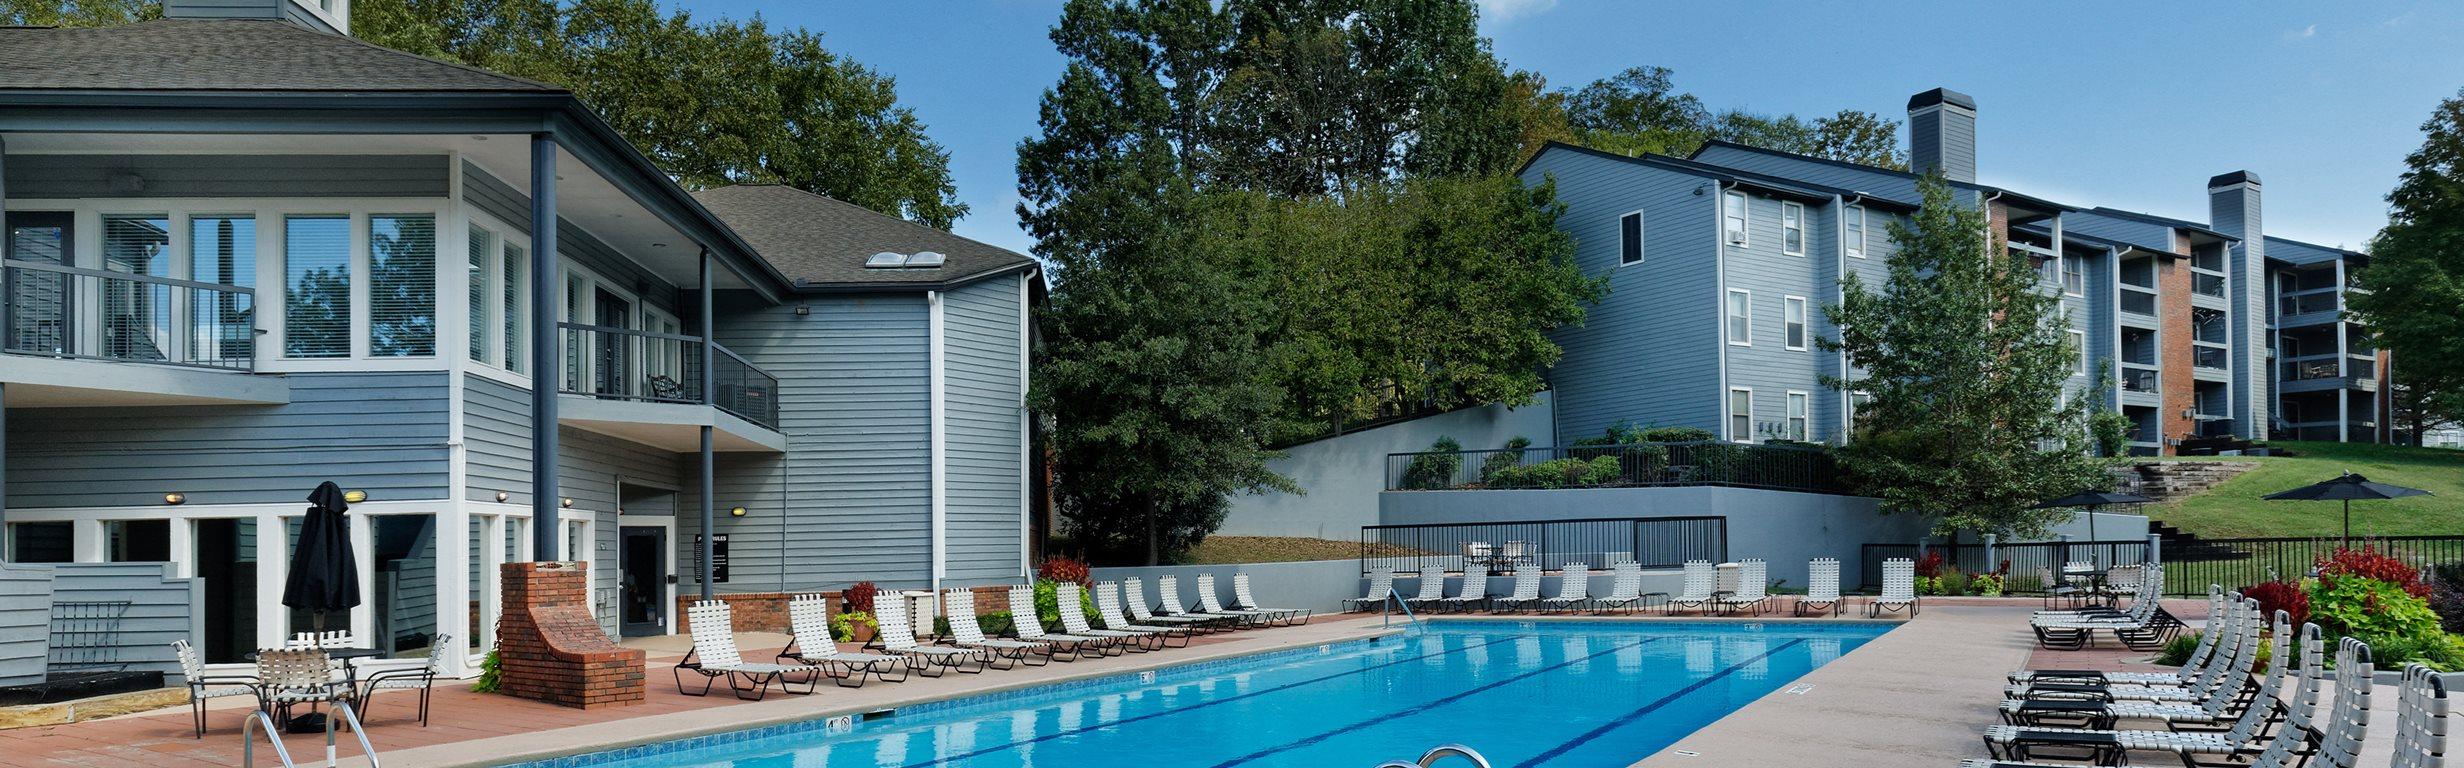 Arbor Hills Apartments pool area